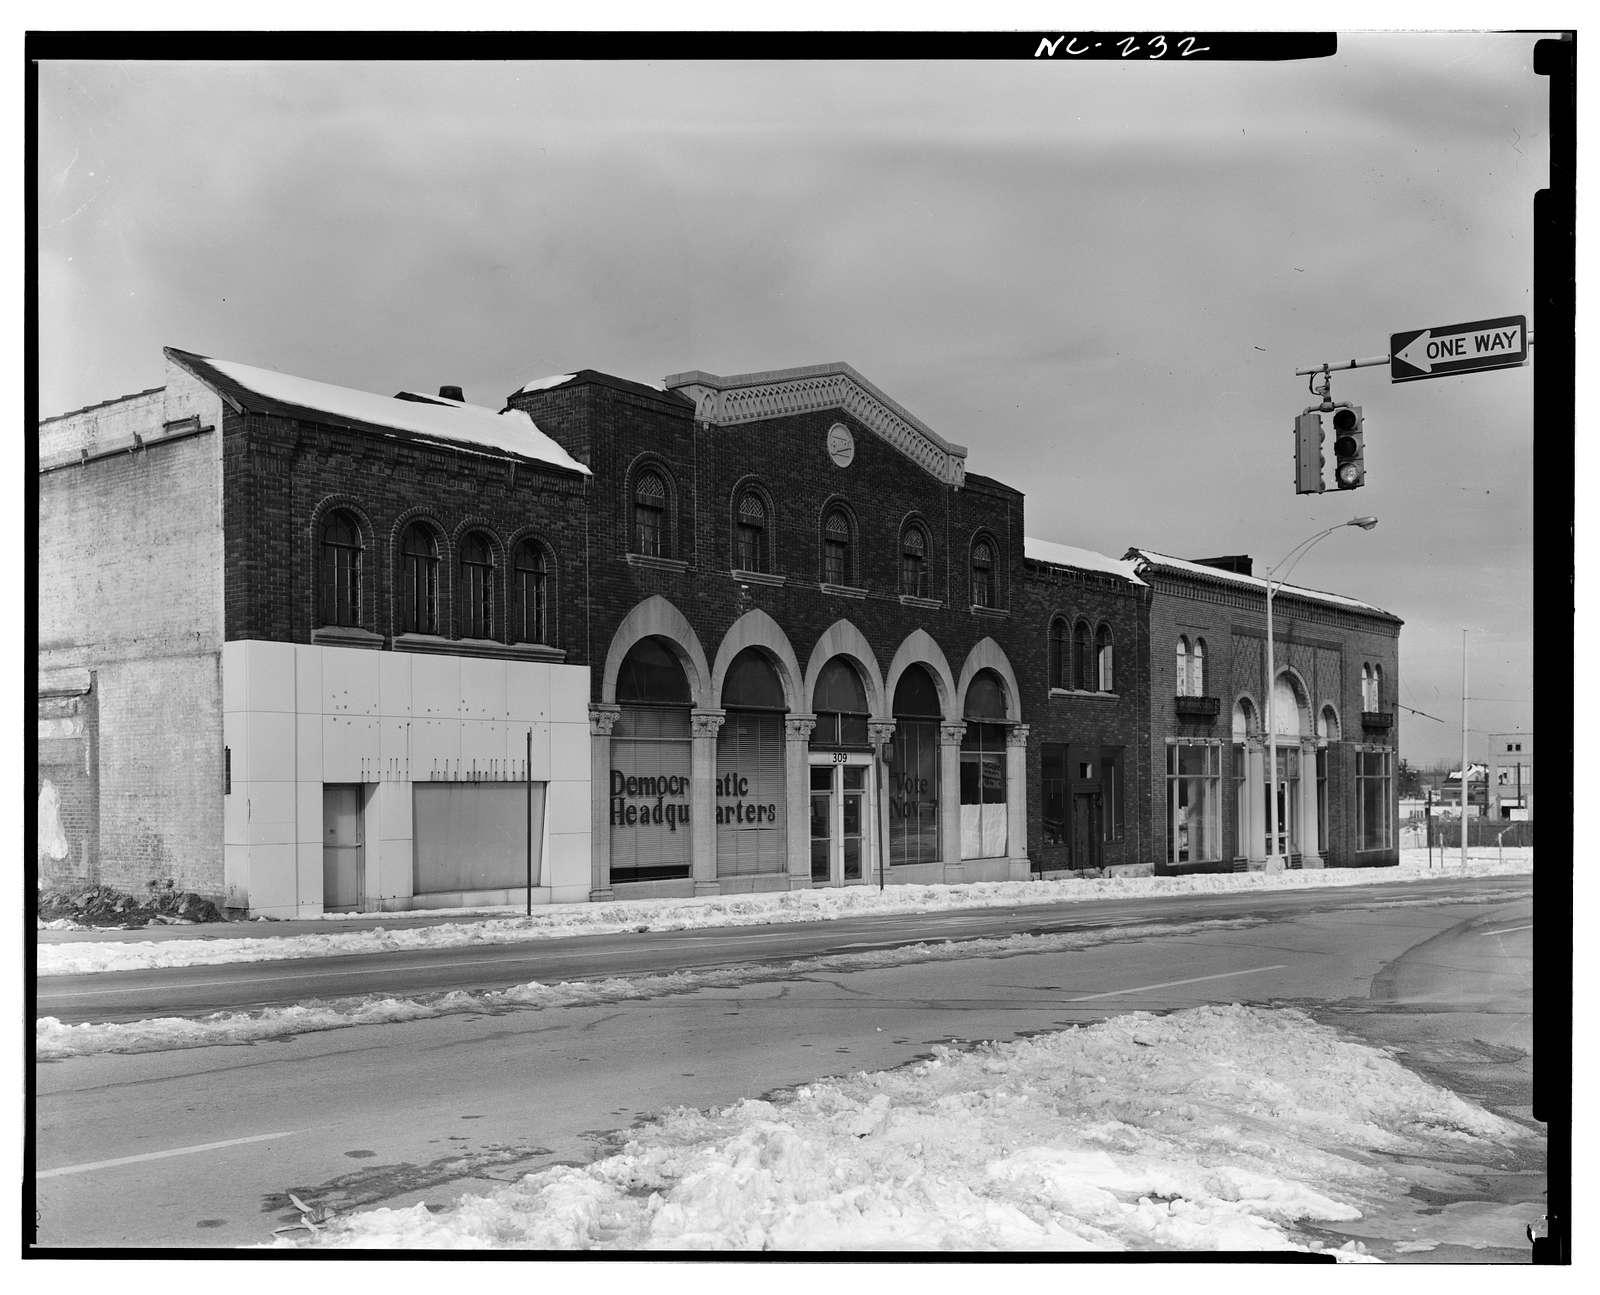 Buick Motor Company & Greensboro Motor Company Dealerships, 309 & 315 North Elm Street, Greensboro, Guilford County, NC